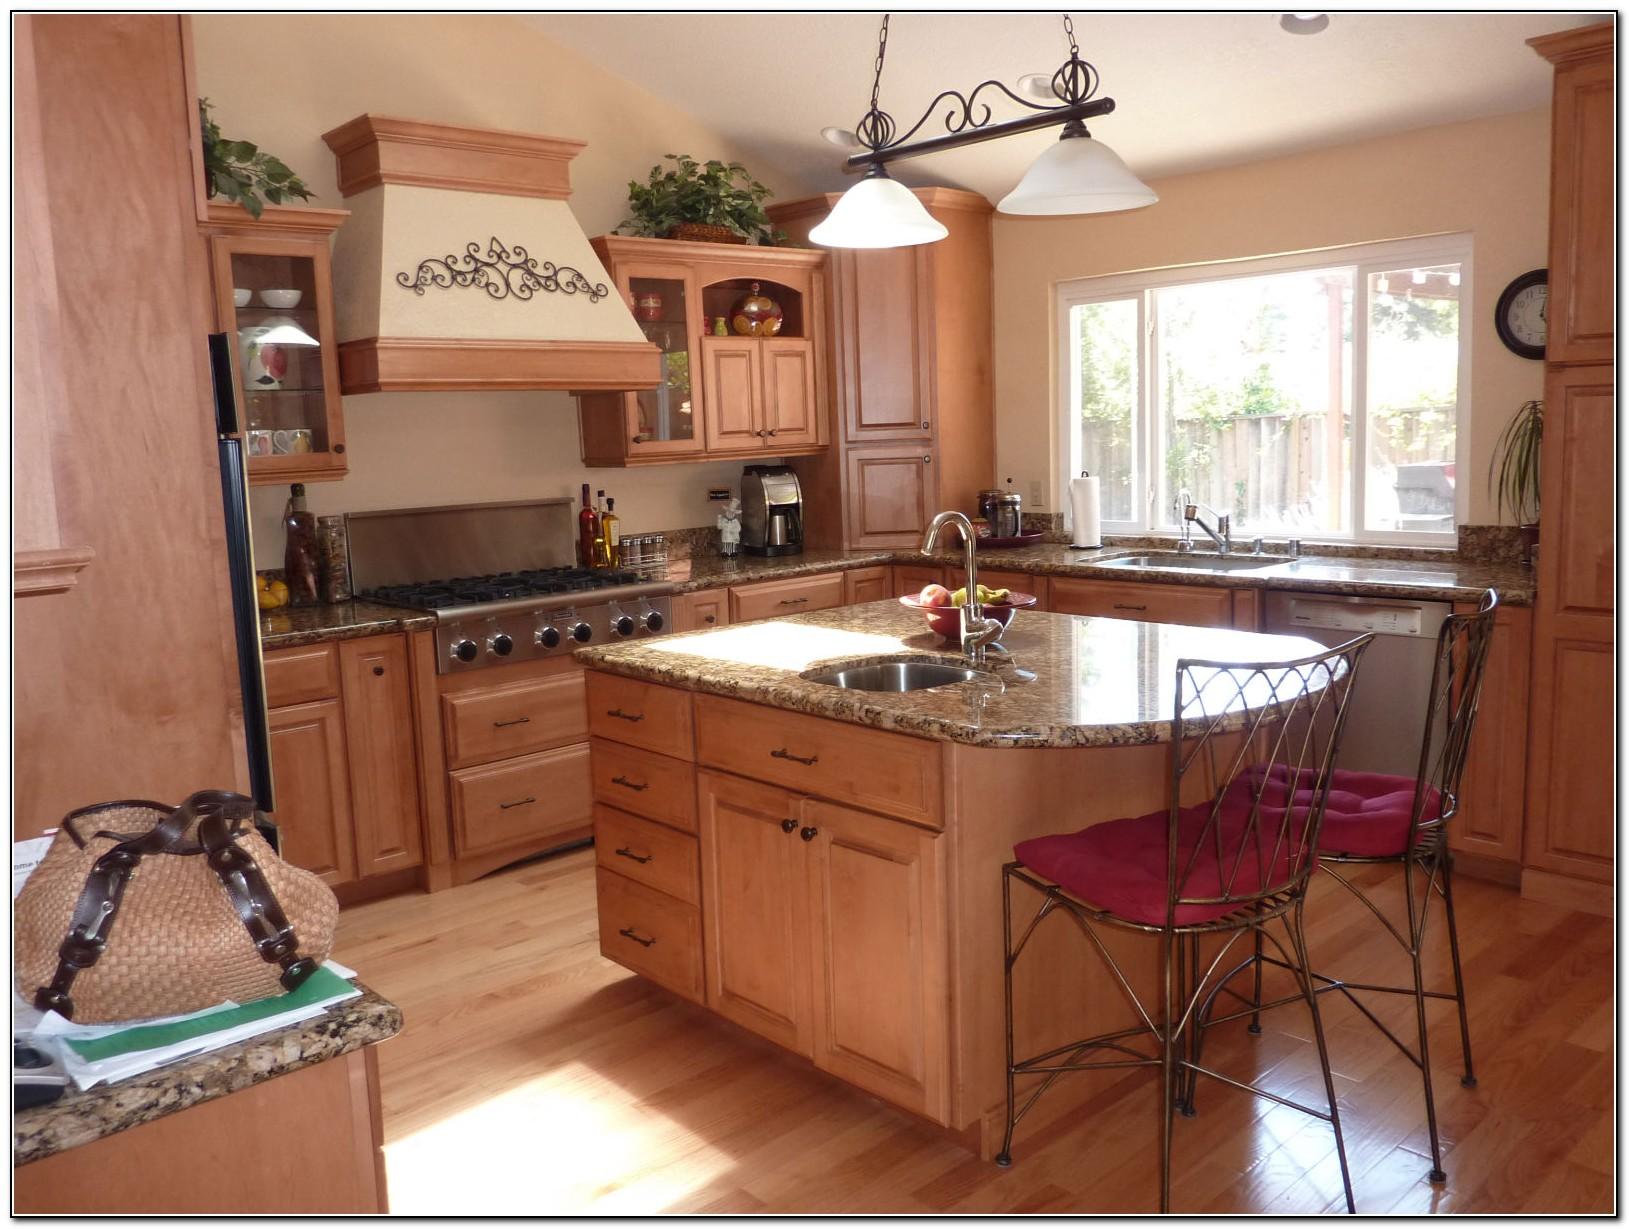 Kitchen Island Ideas With Seating Uk Kitchen Home Design Ideas Wlnx0mln5216143